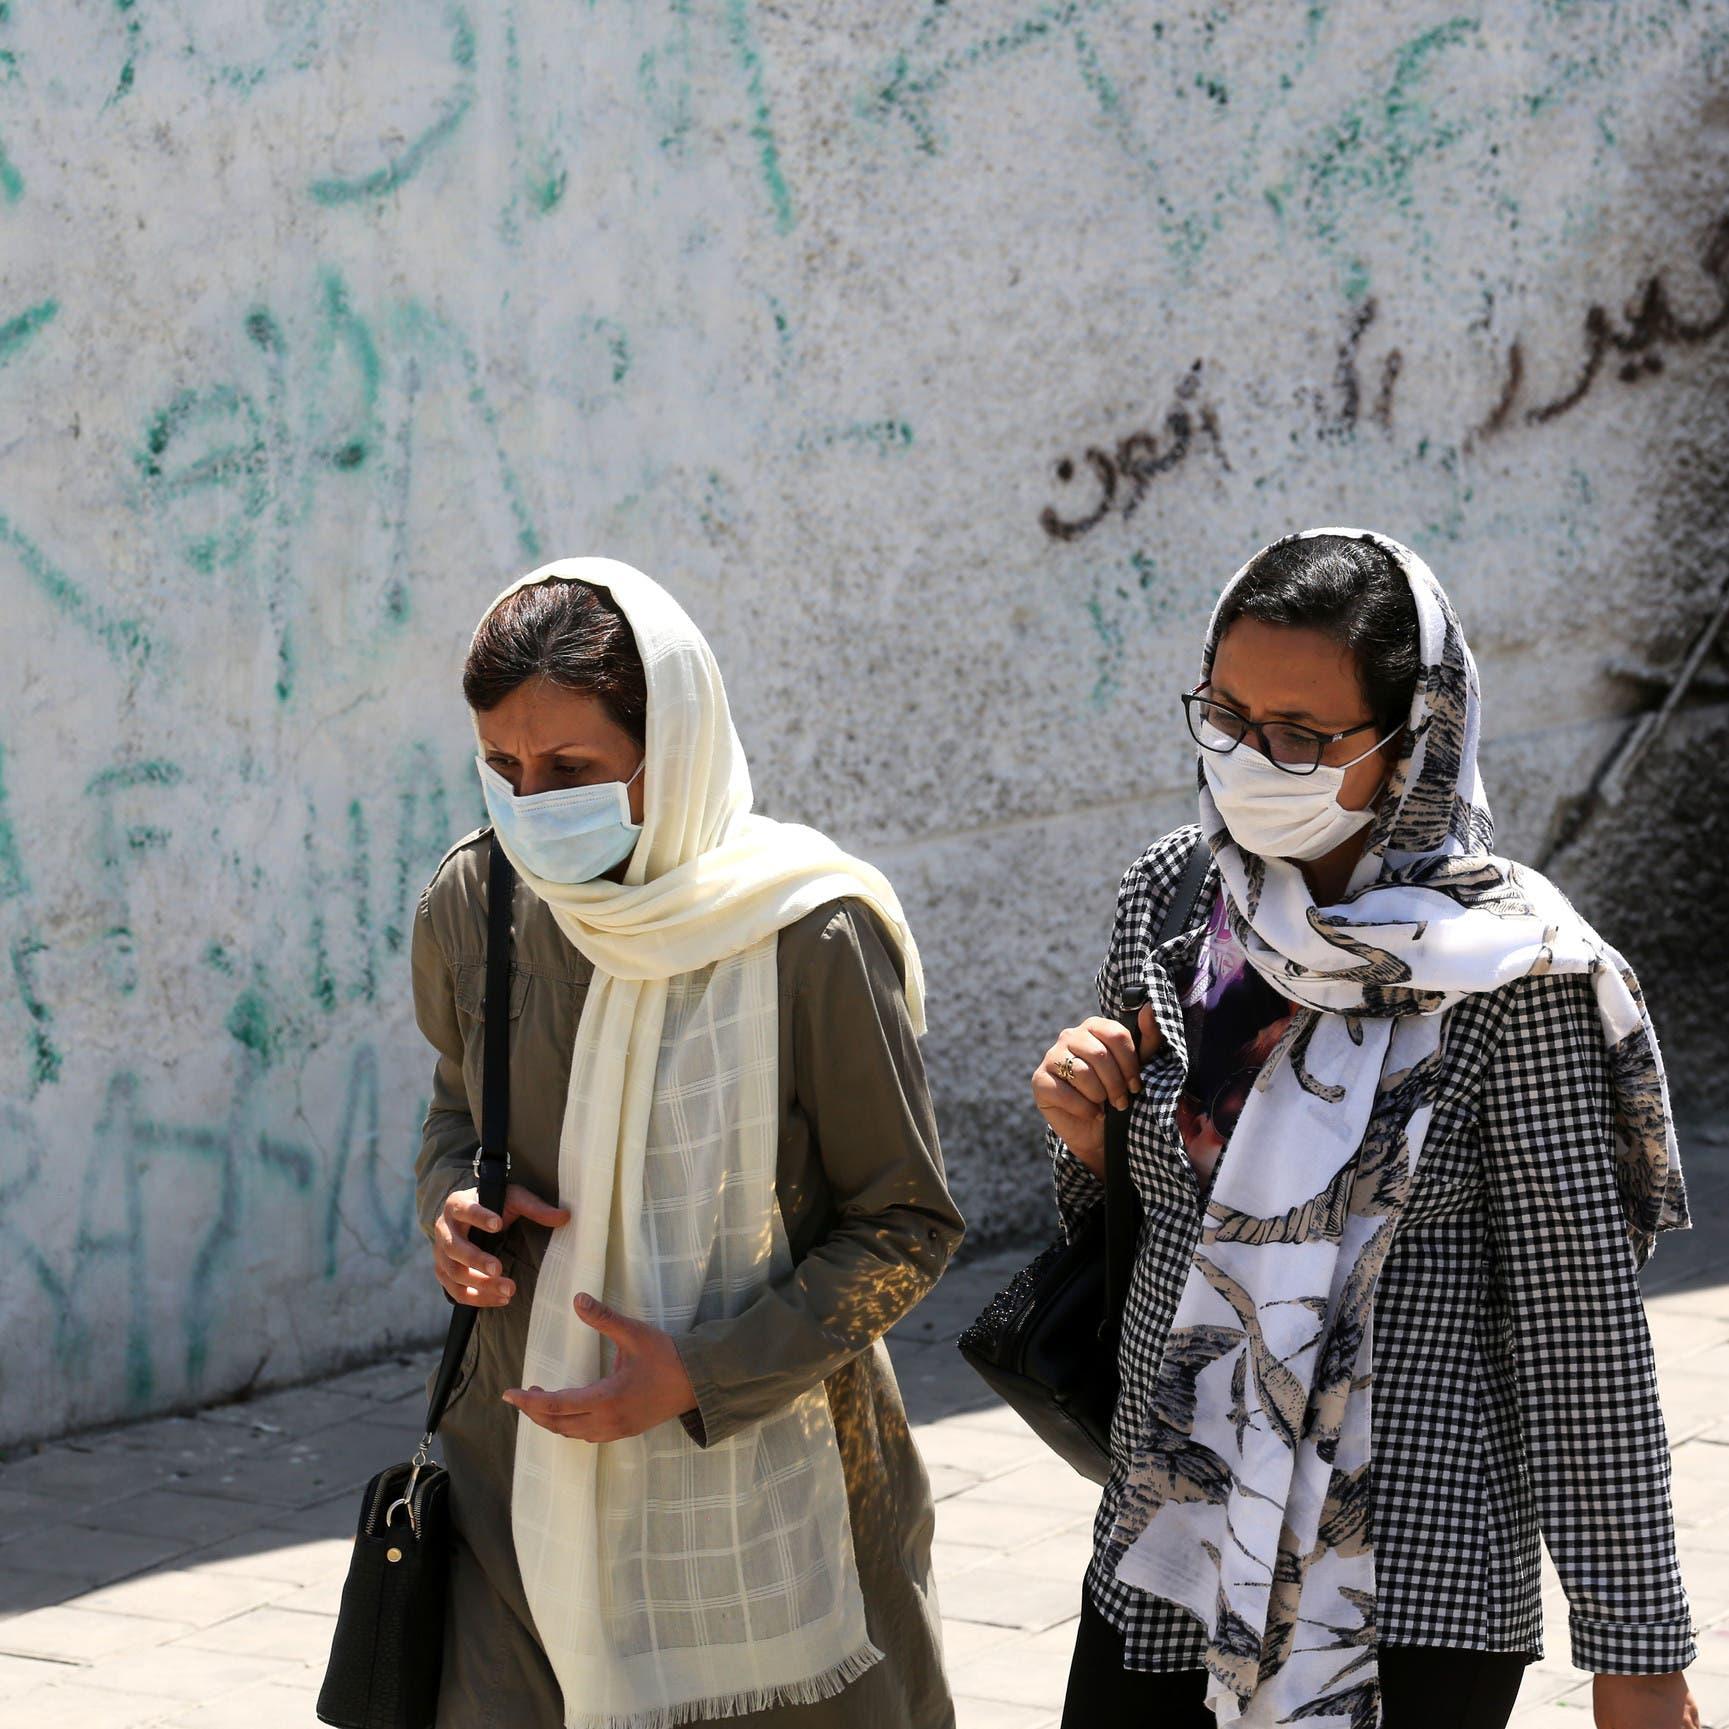 Coronavirus: Iran's Rouhani authorizes provinces to impose COVID-19 lockdown